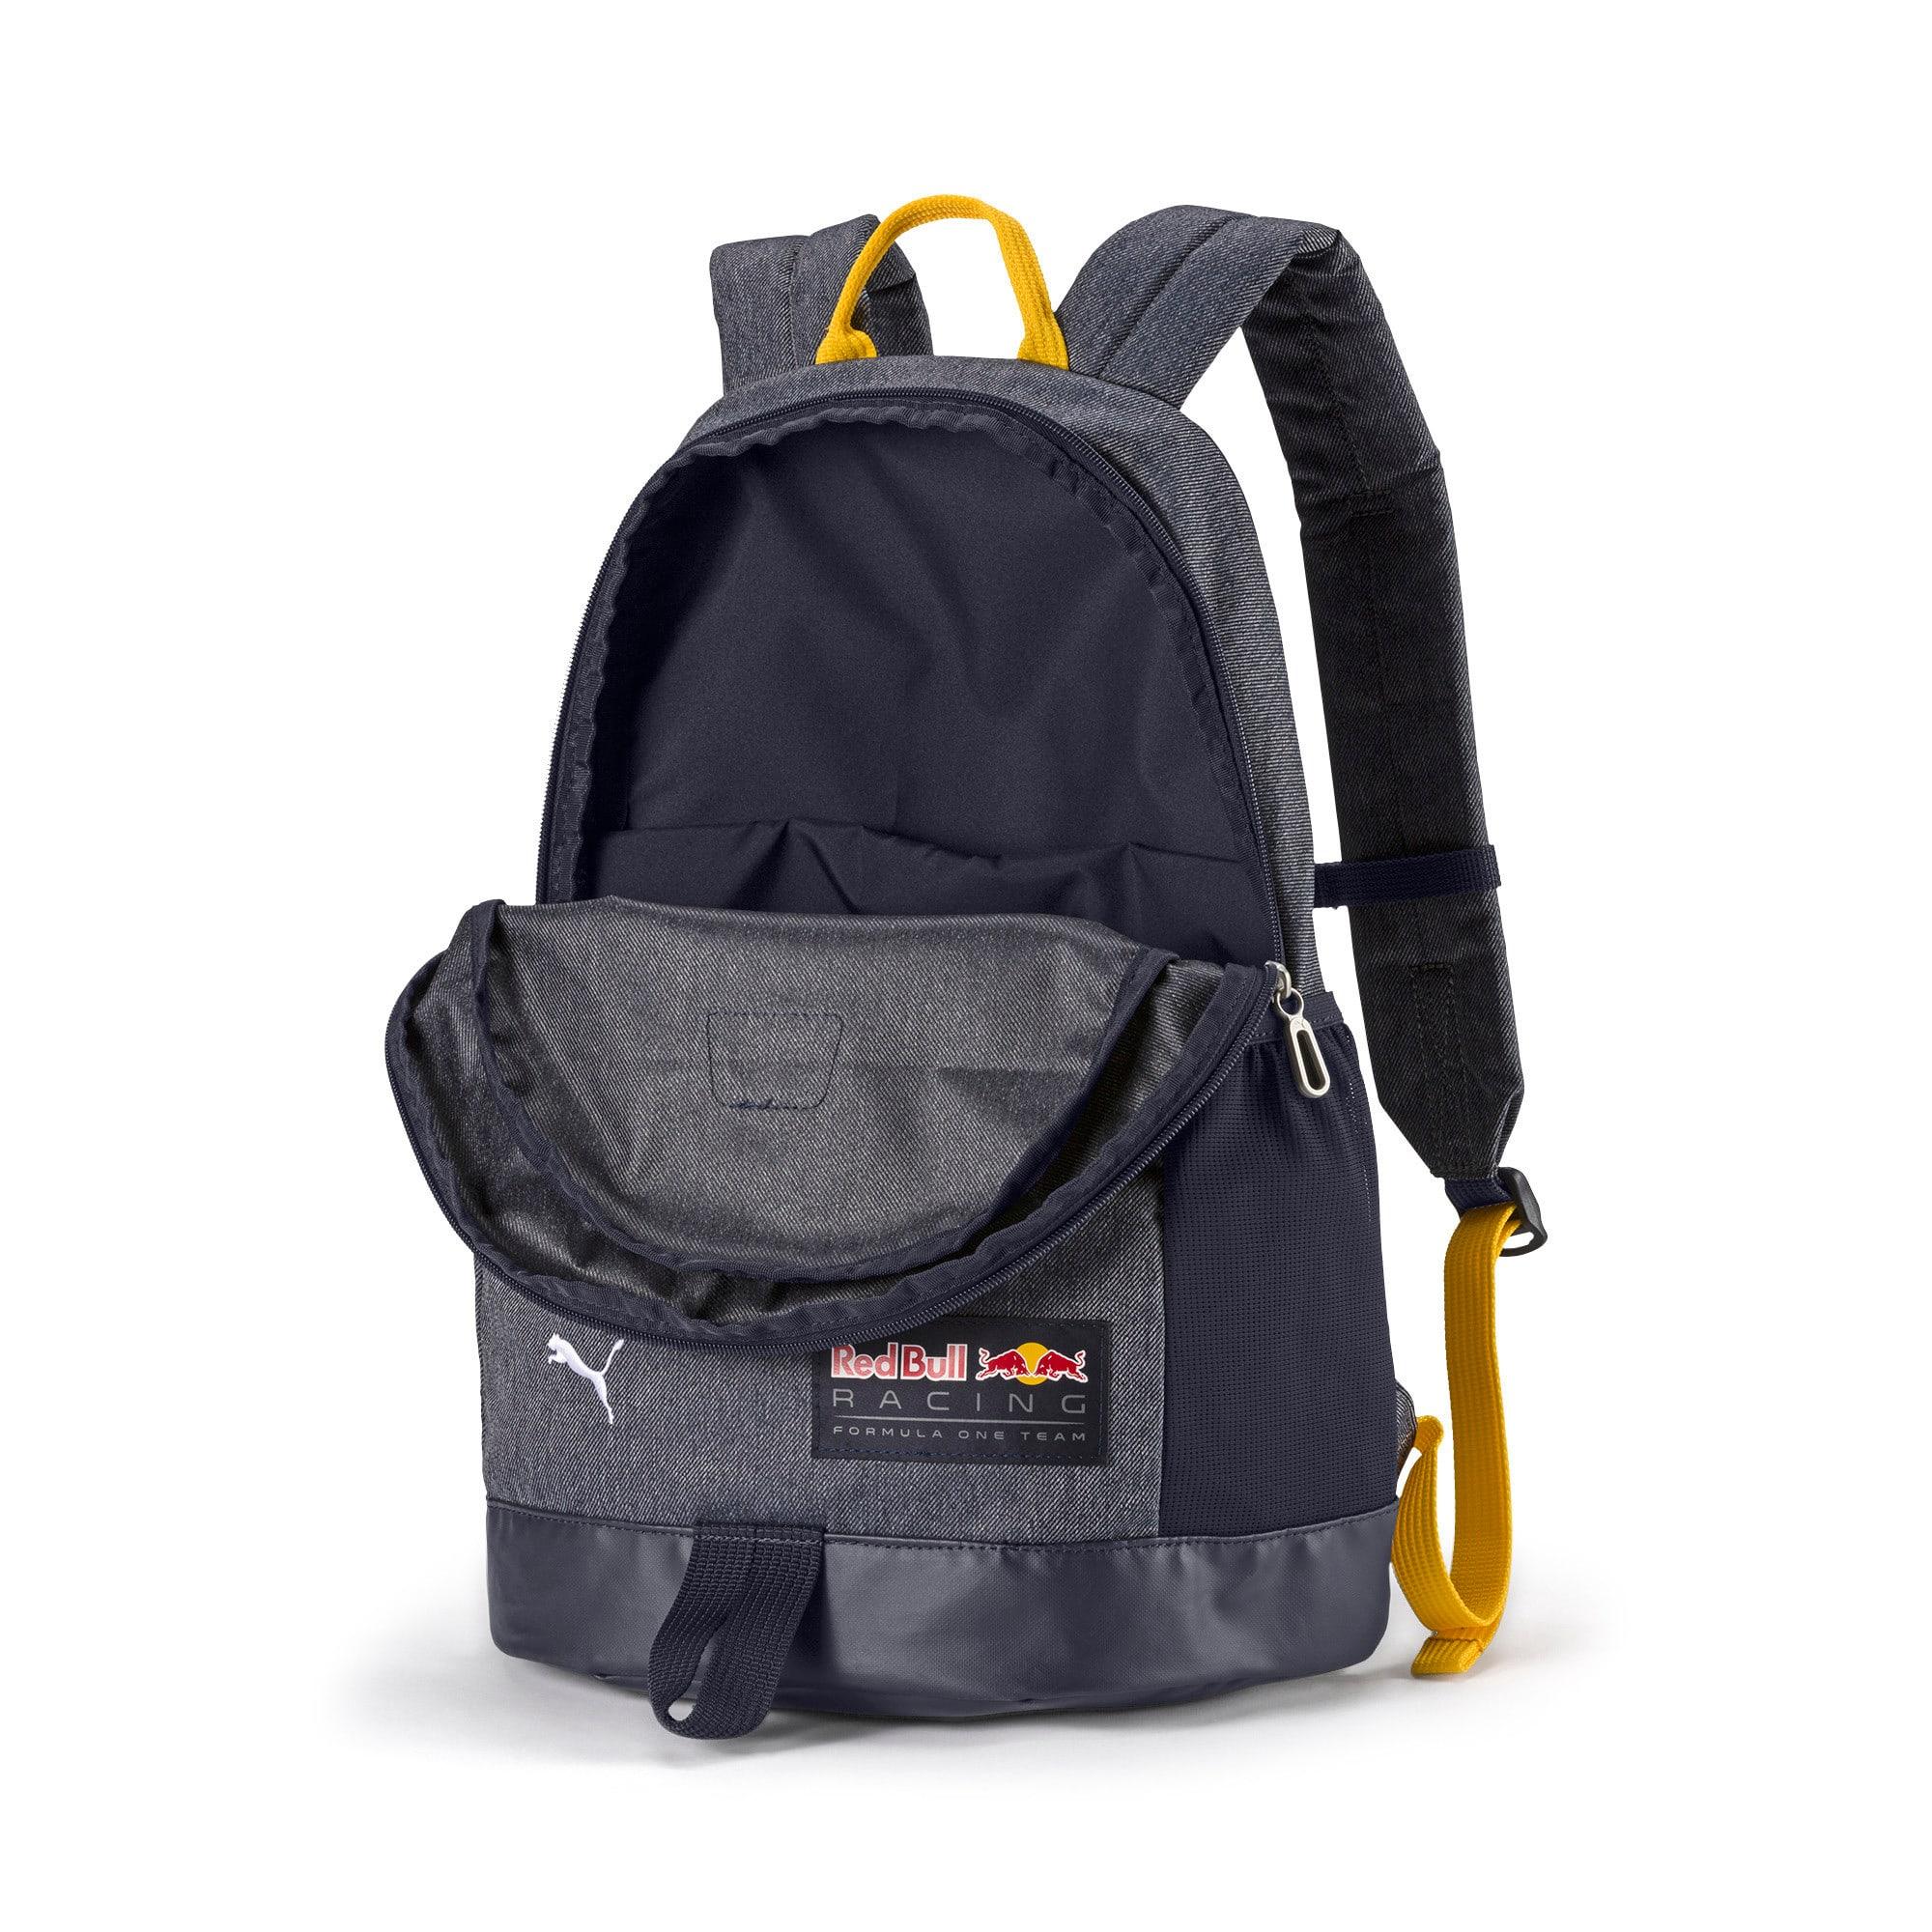 Thumbnail 3 of Red Bull Racing Lifestyle Backpack, NIGHT SKY, medium